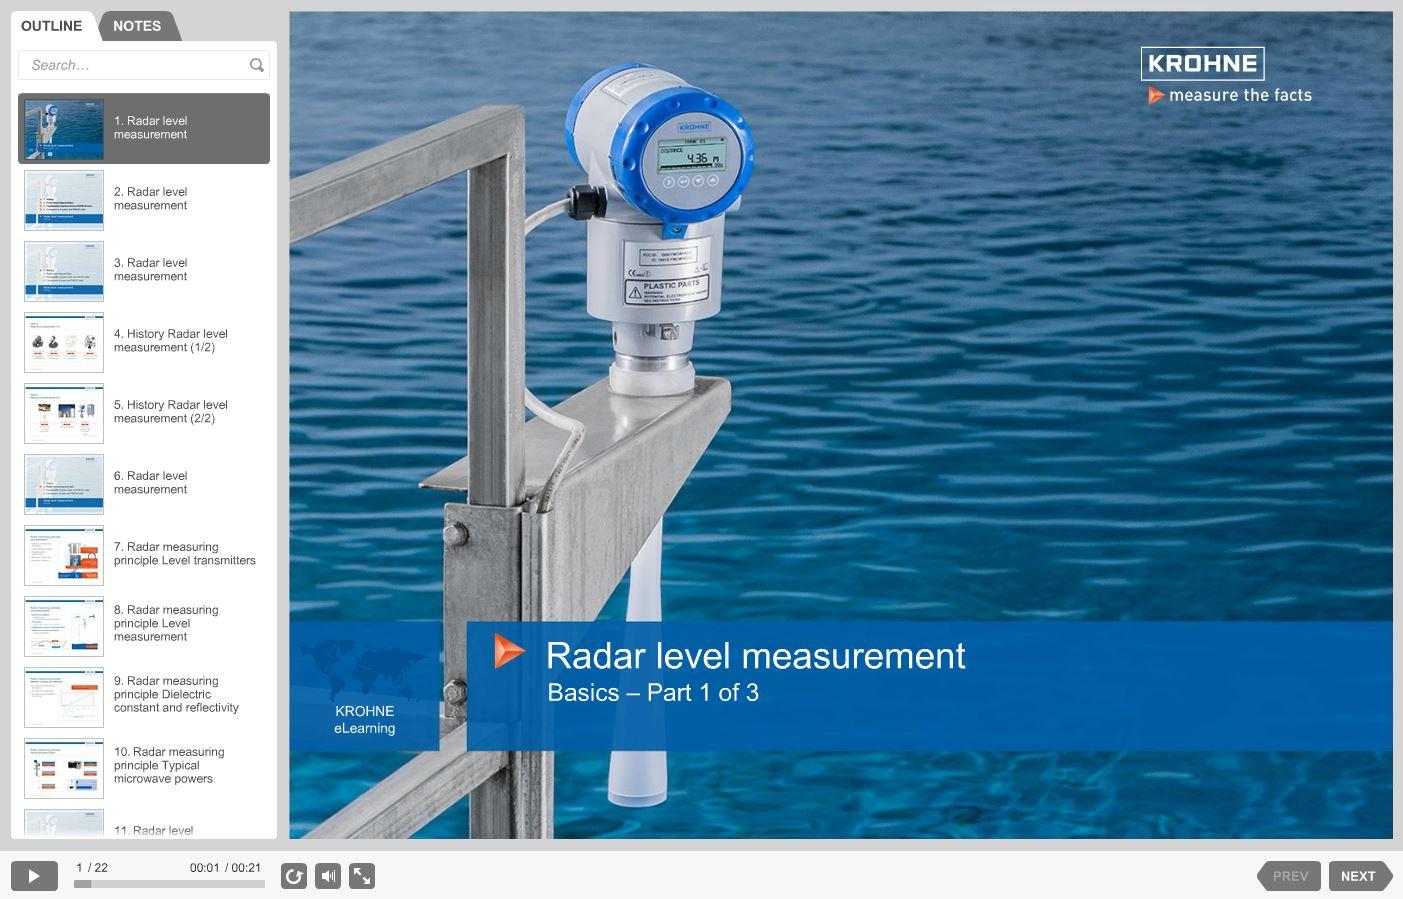 eLearning Radar Level Measurement – Title